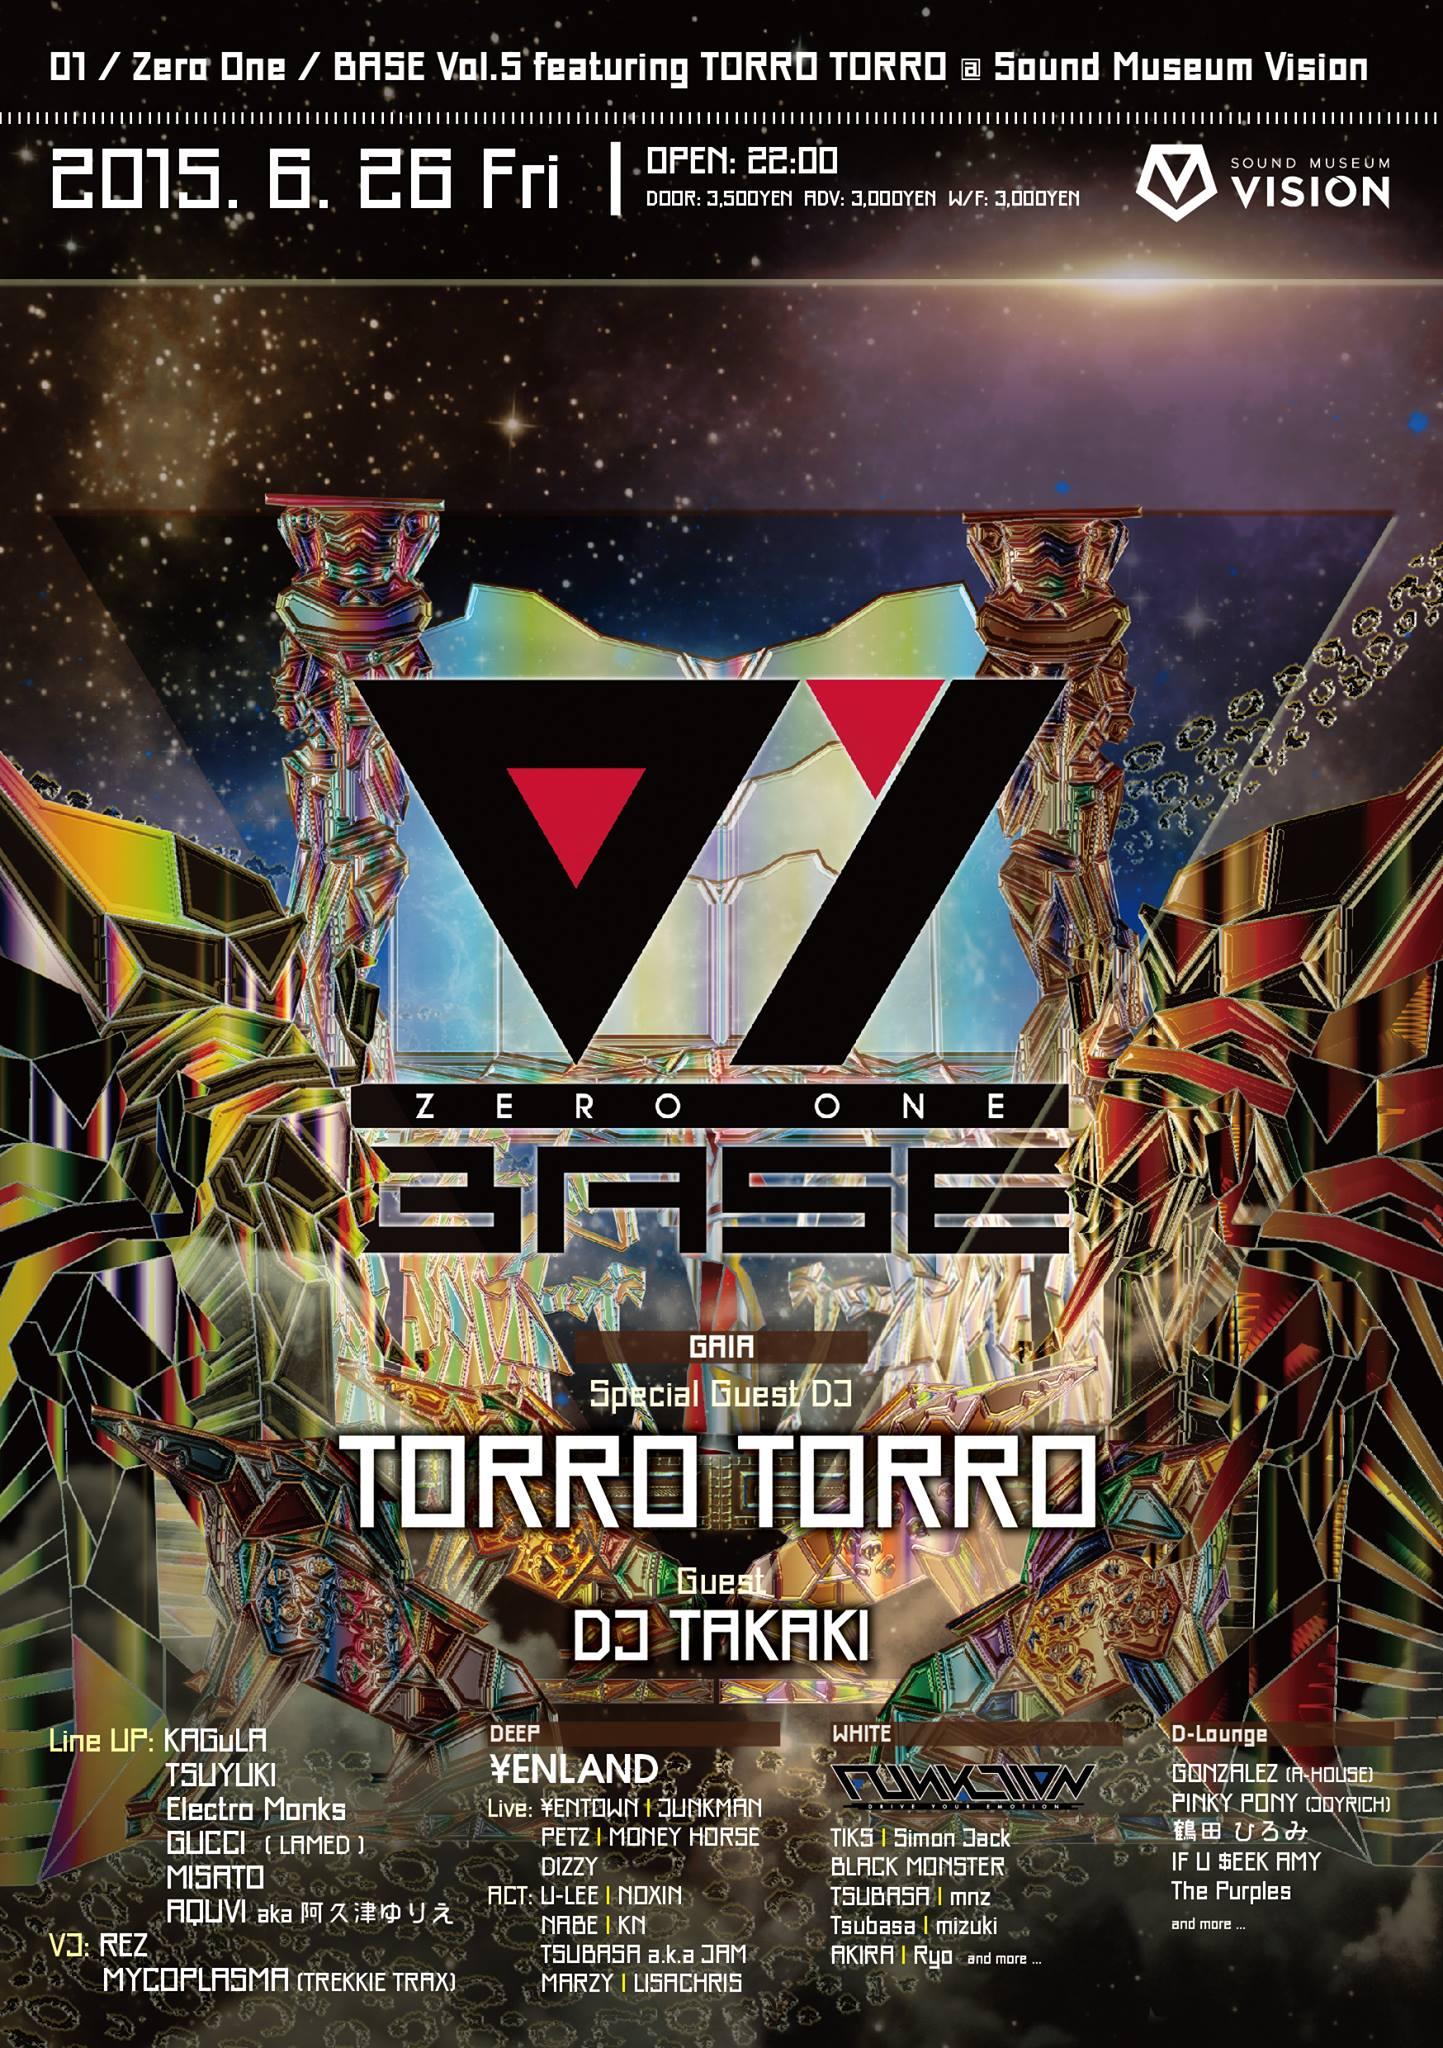 01/Zero One/BASE-TORROTORRO